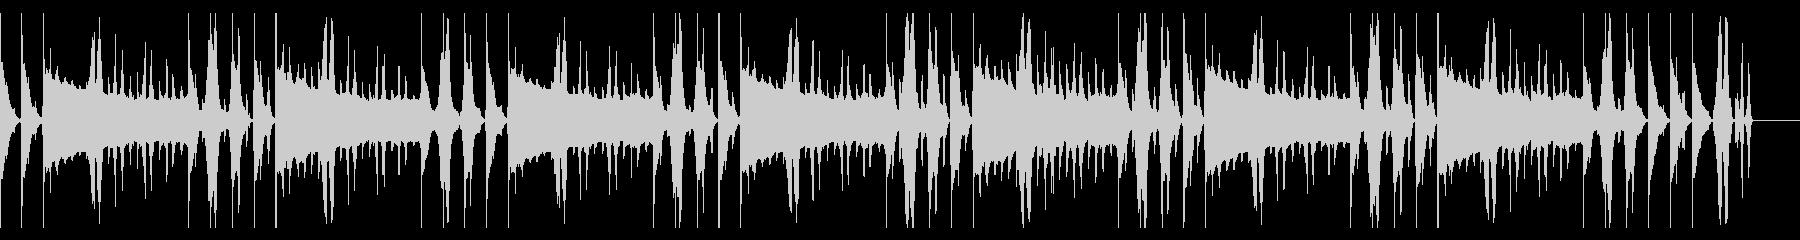 114 BPMの未再生の波形